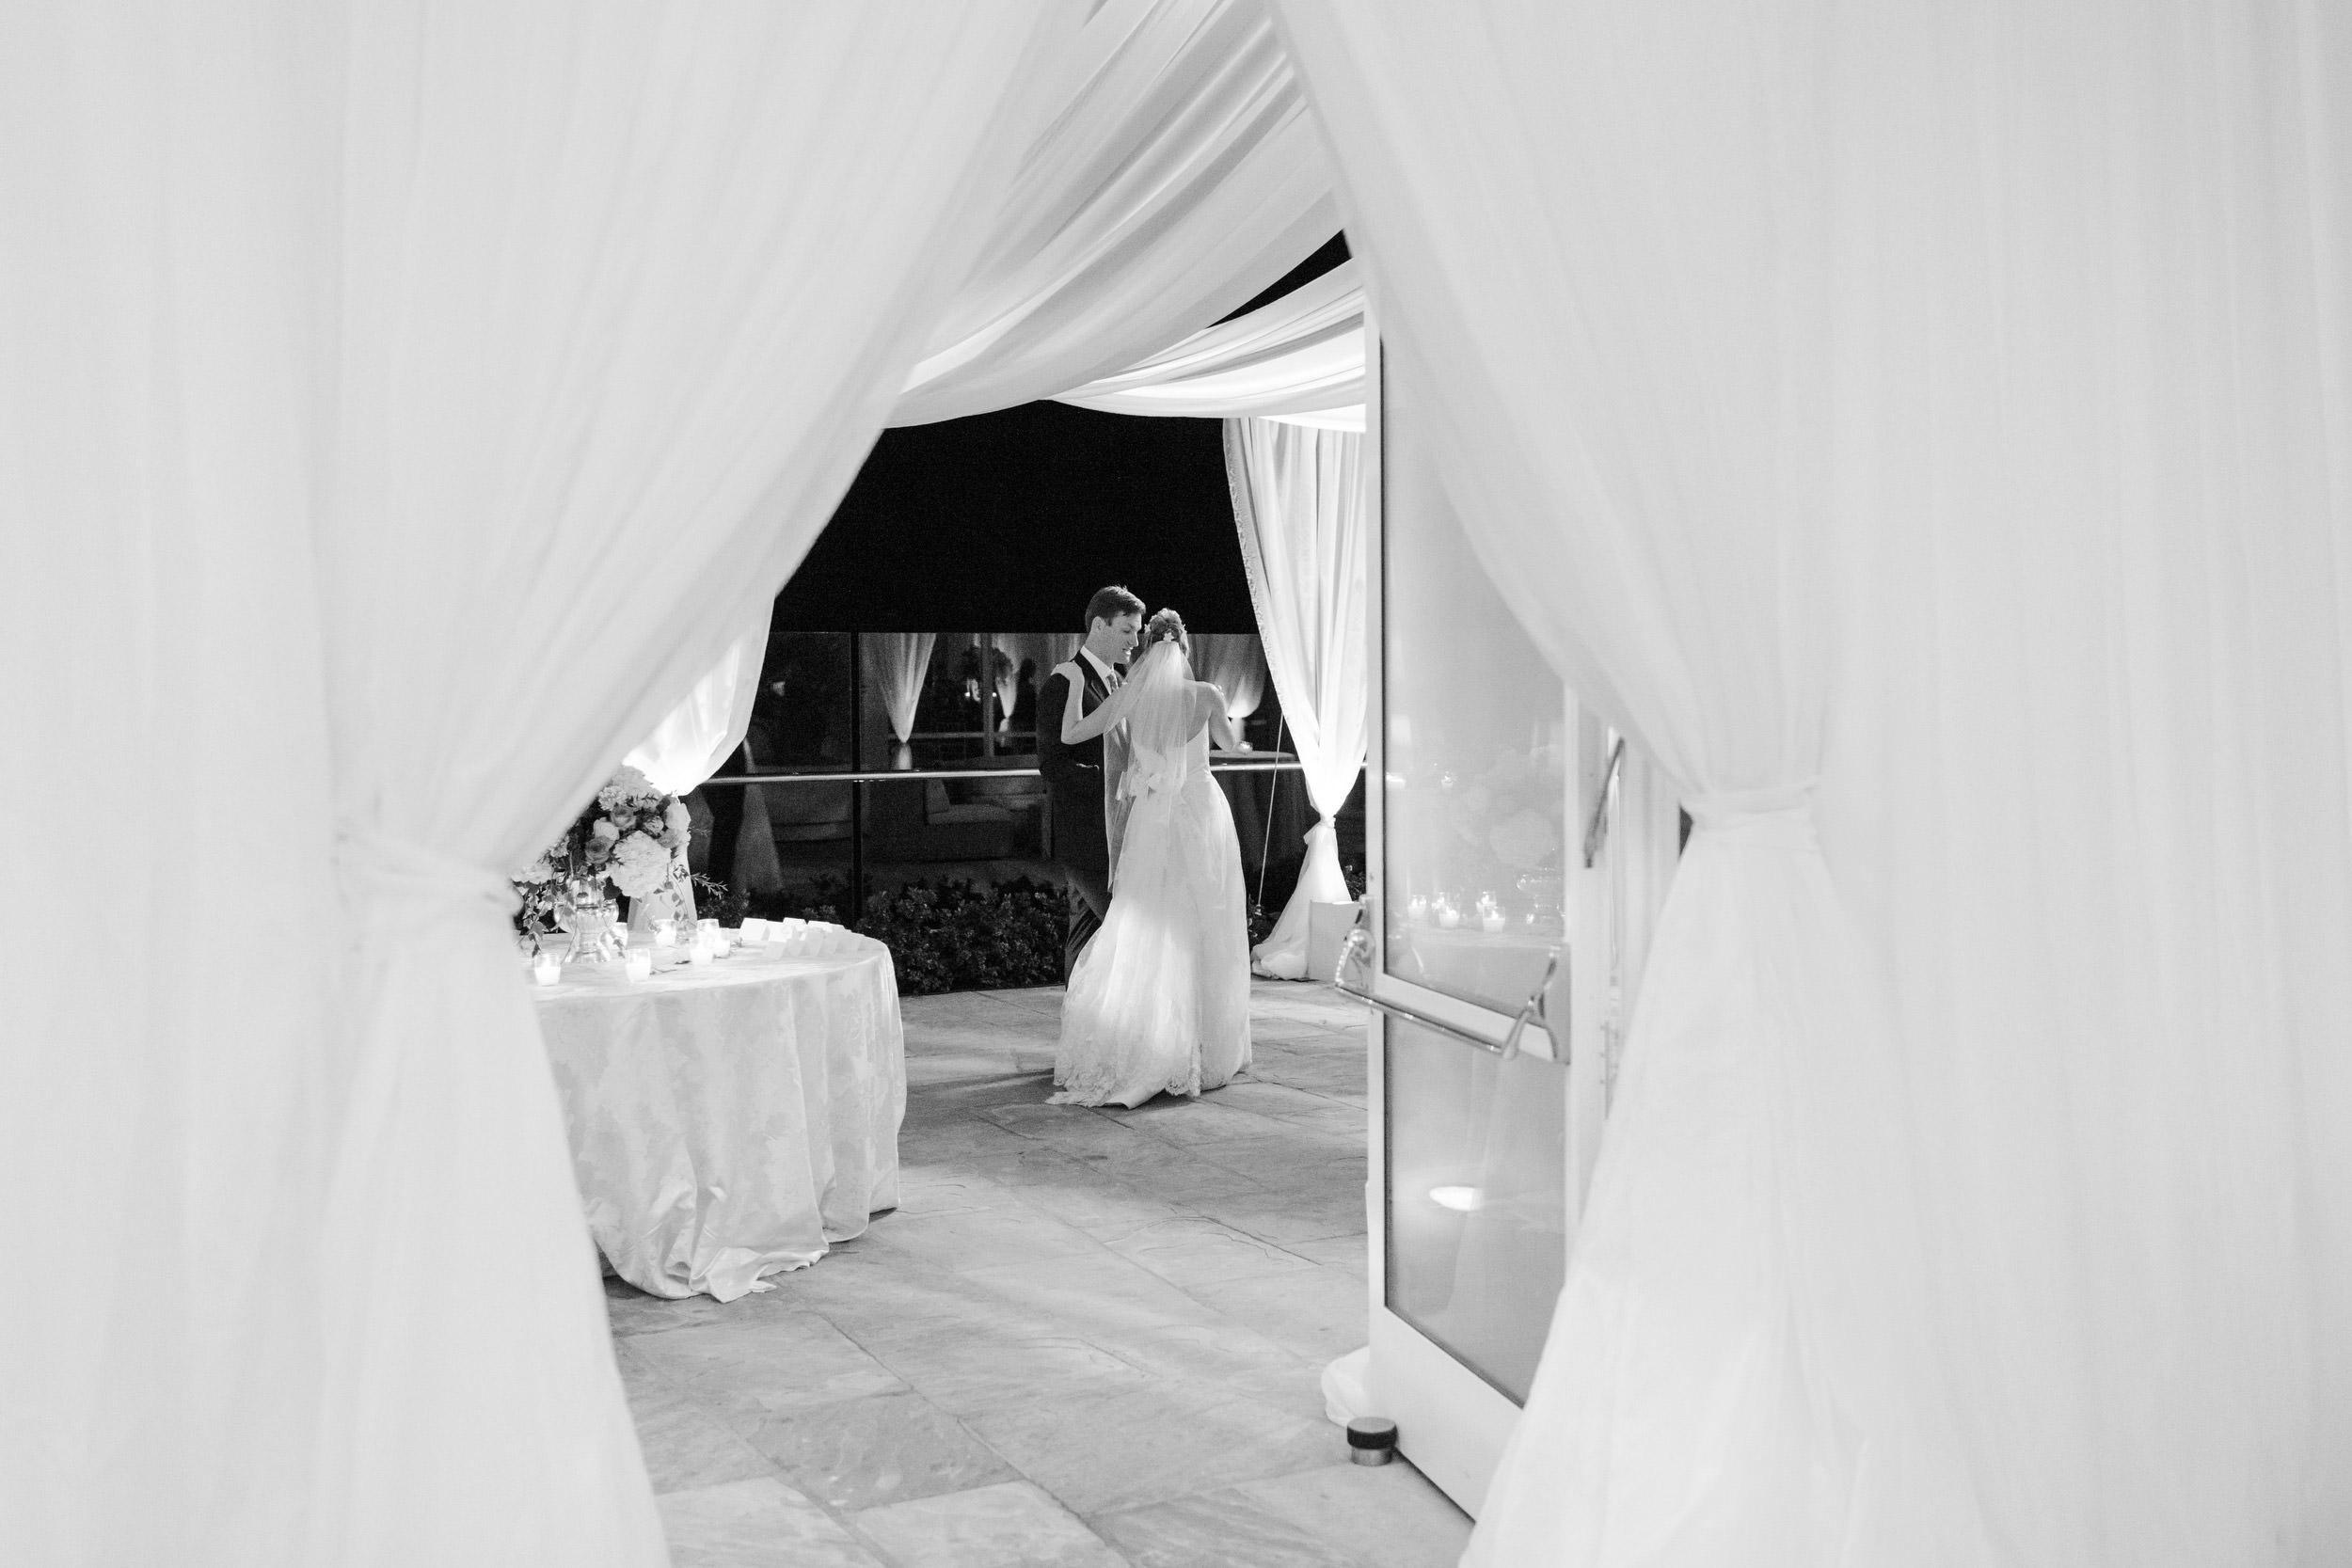 biltmore_santa_barbara_wedding_photos_coral_casino_056.jpg